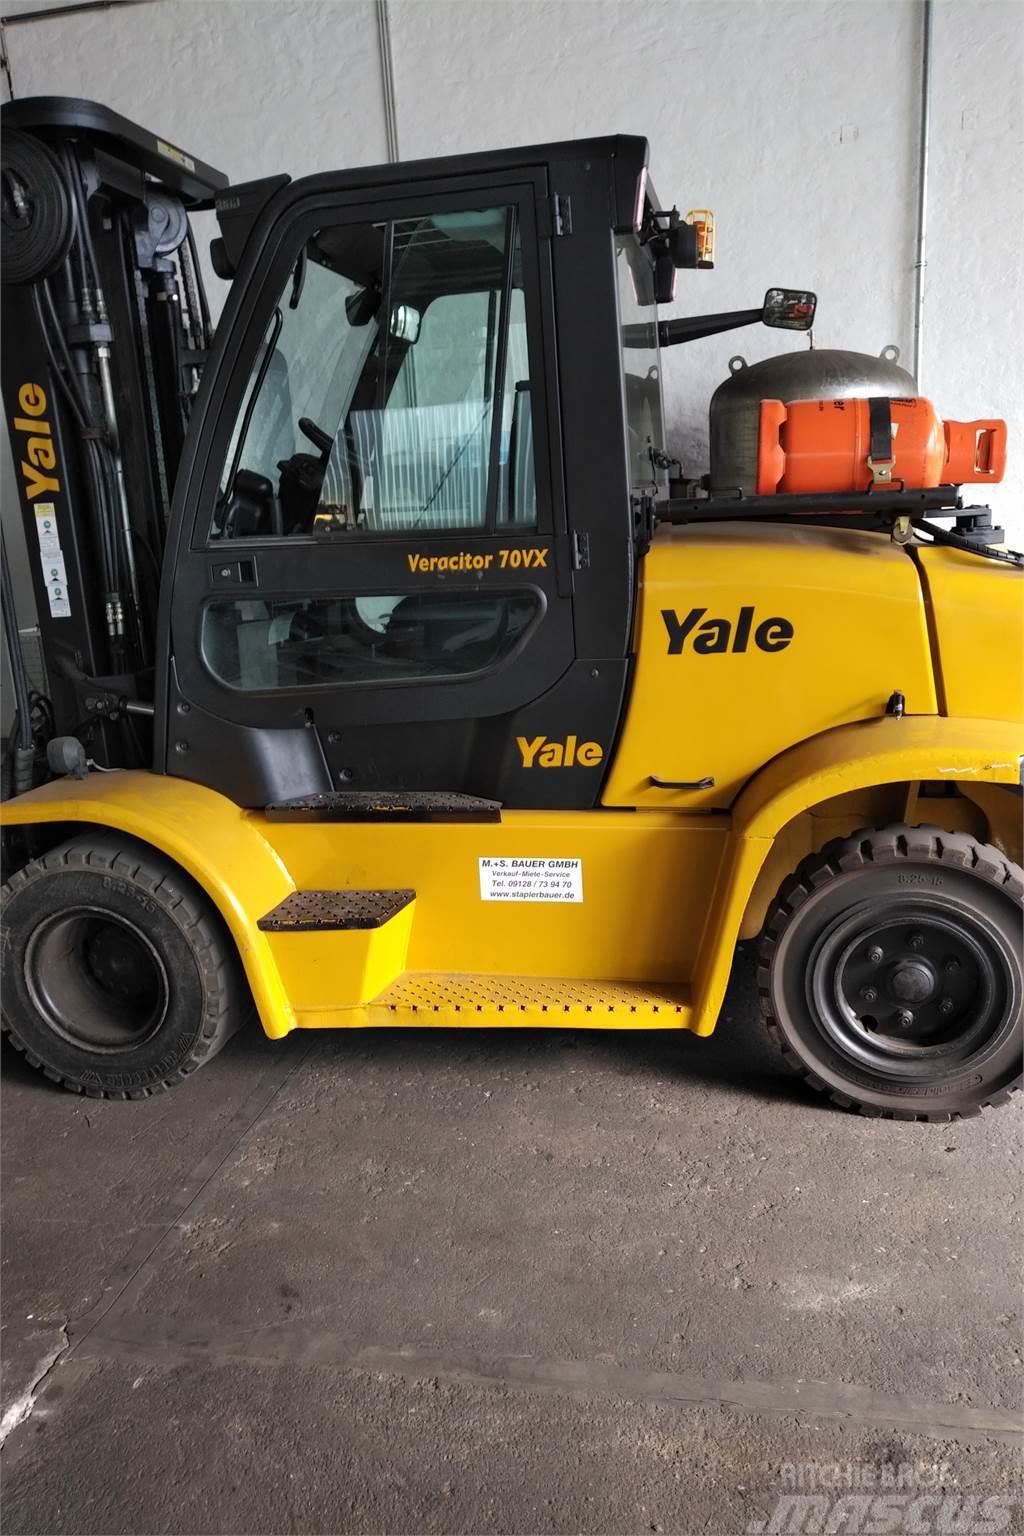 Yale GLP70VX